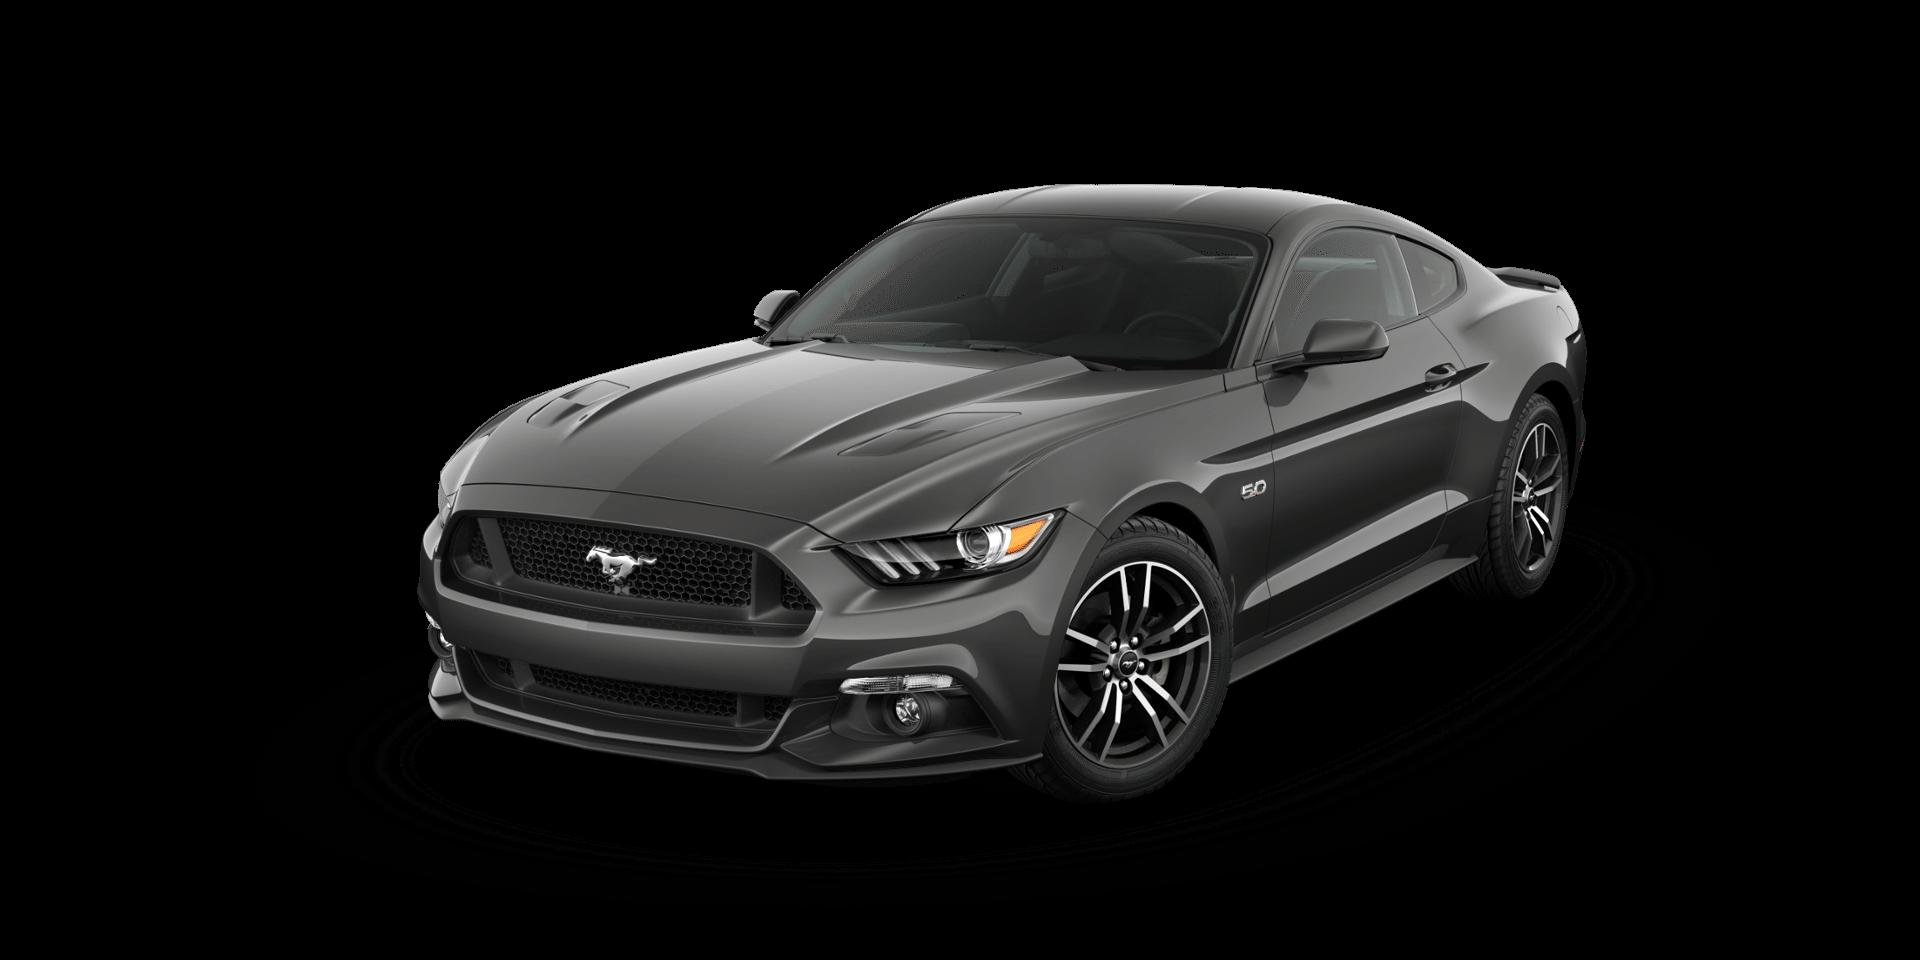 2017 Mustang GT Fastback